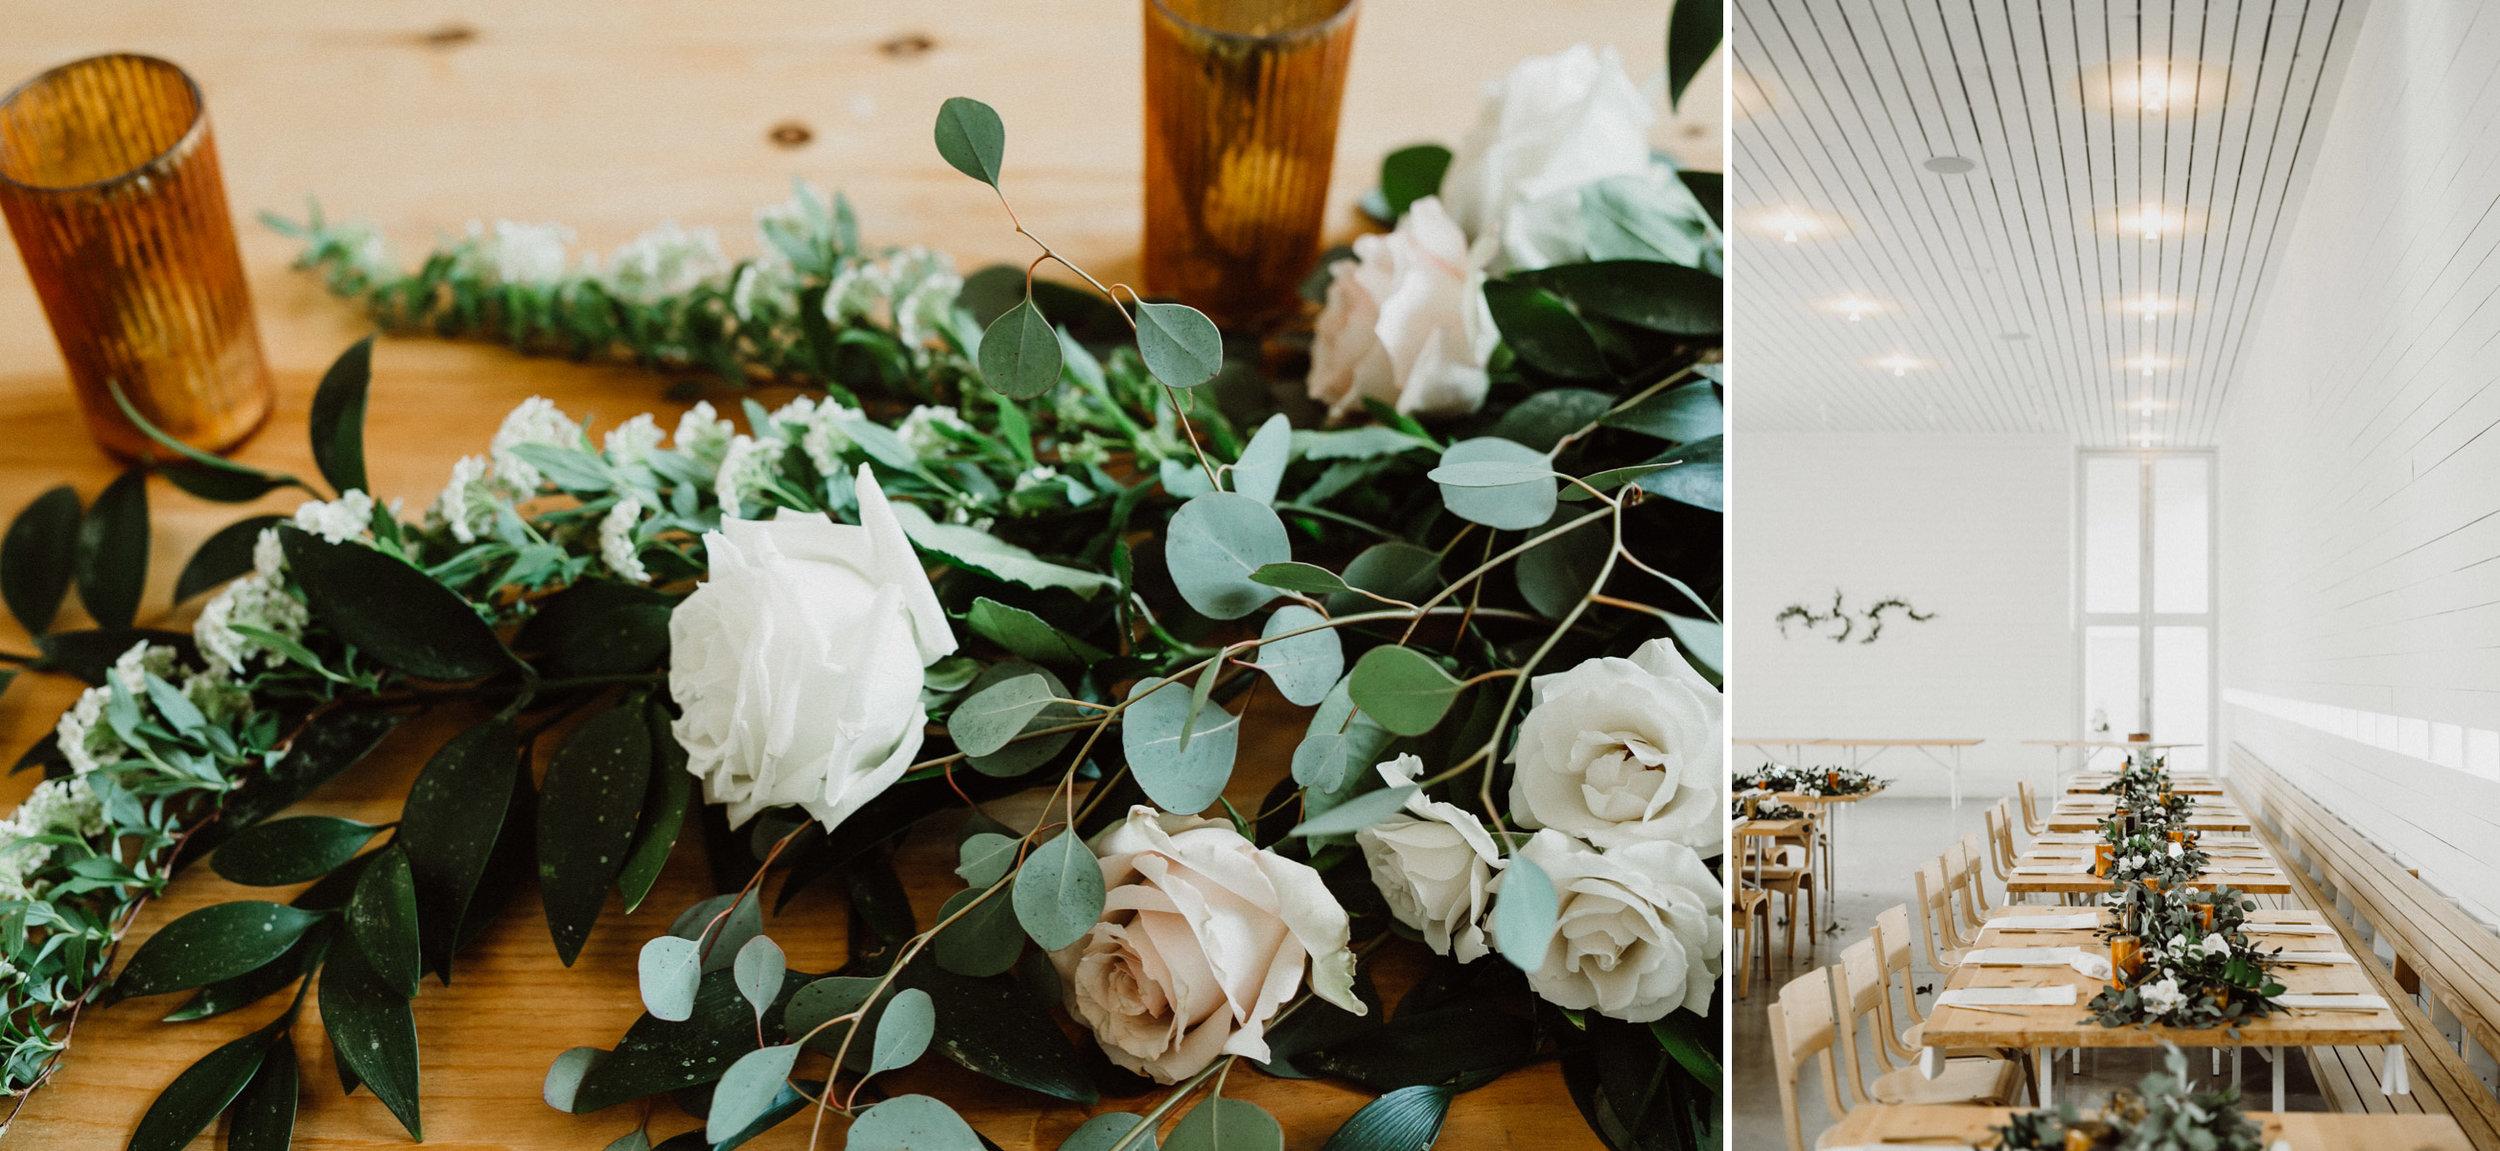 prospect-house-wedding-3.jpg